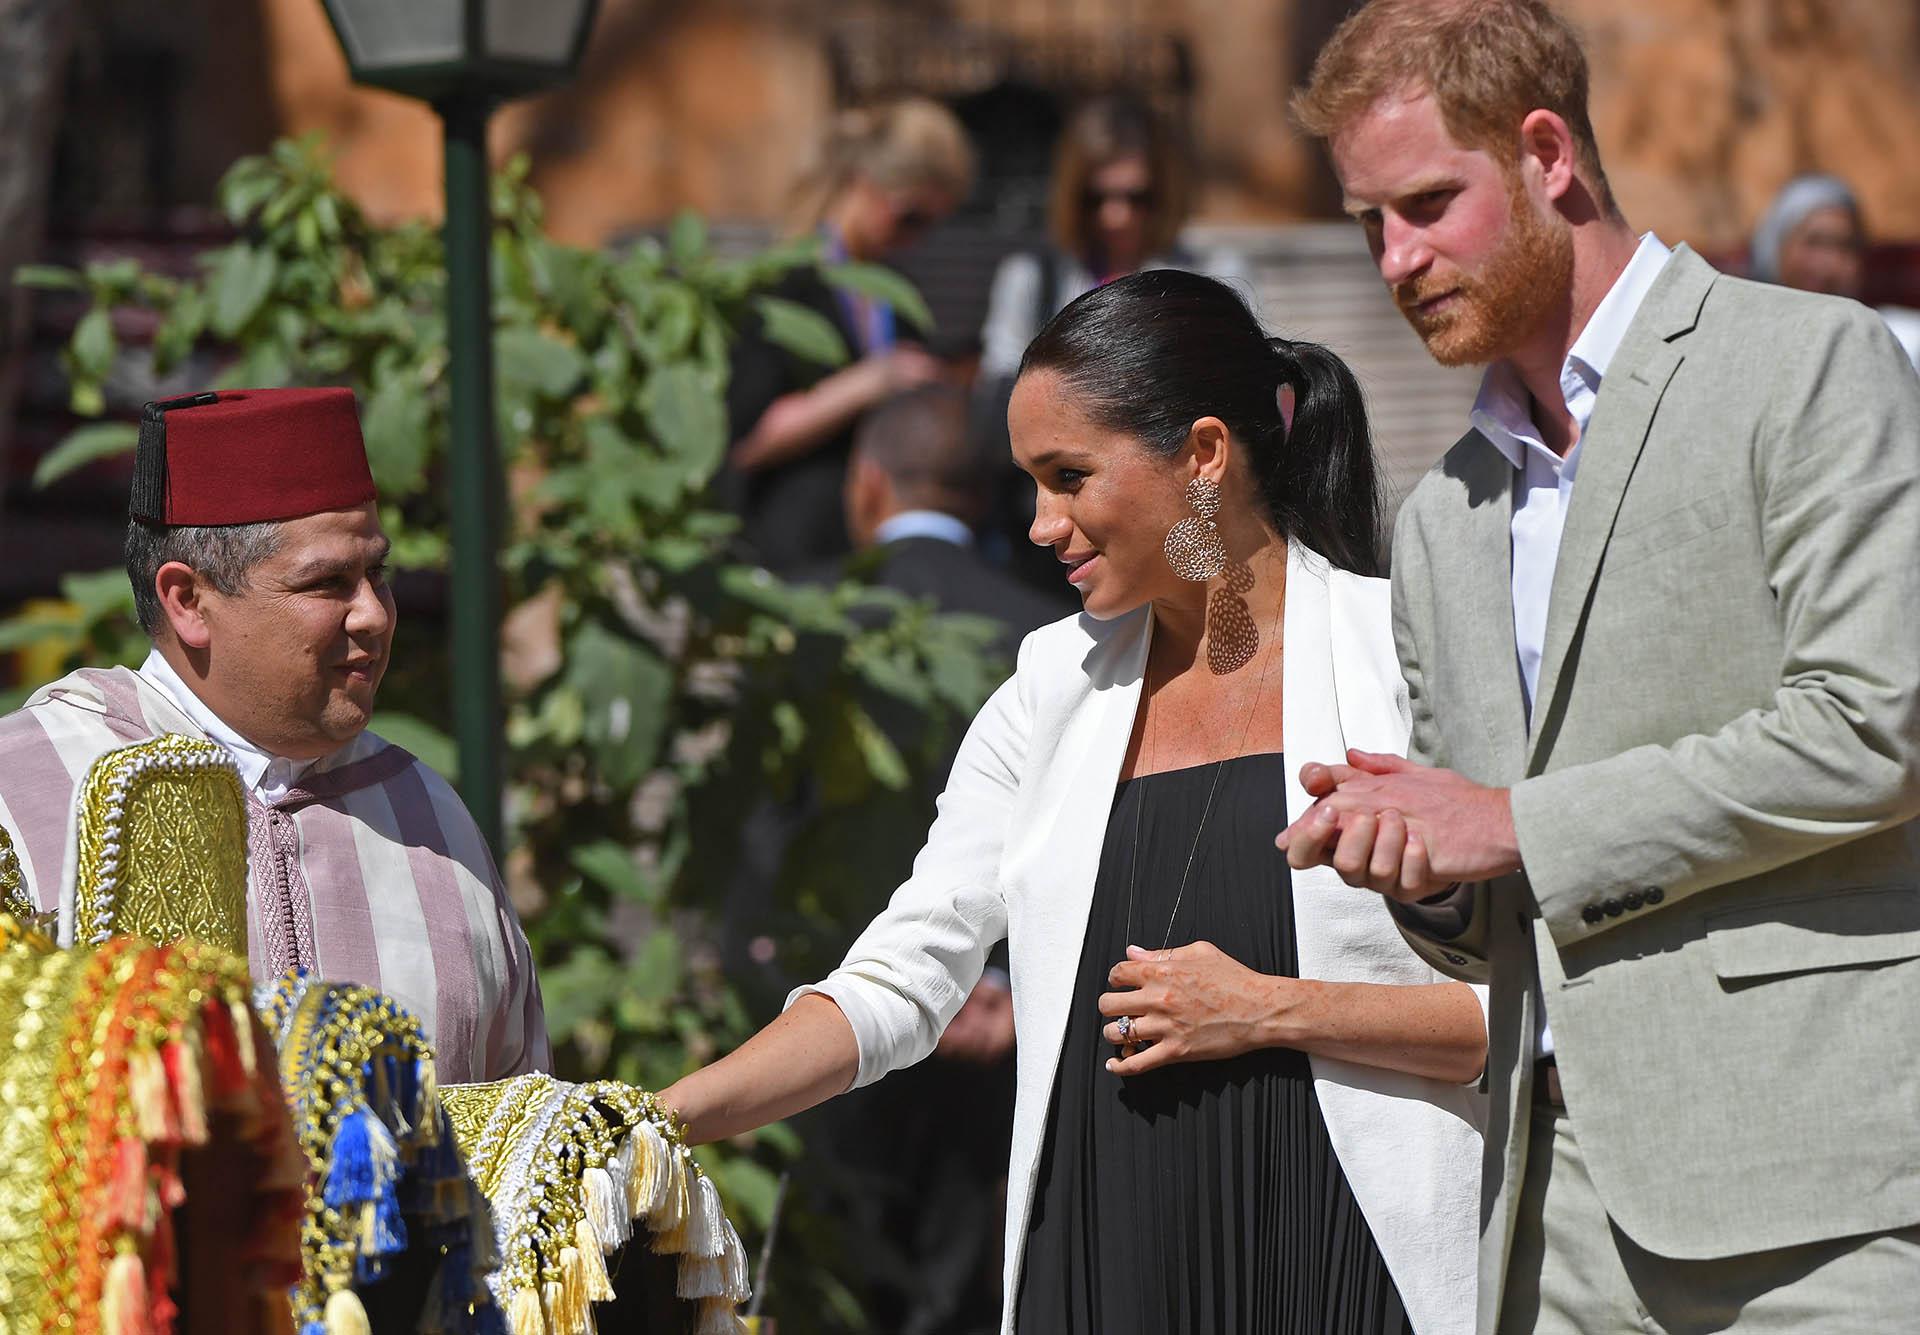 La pareja mantuvo una agenda llena de compromisos sociales. Aquí, de visita a Marruecos